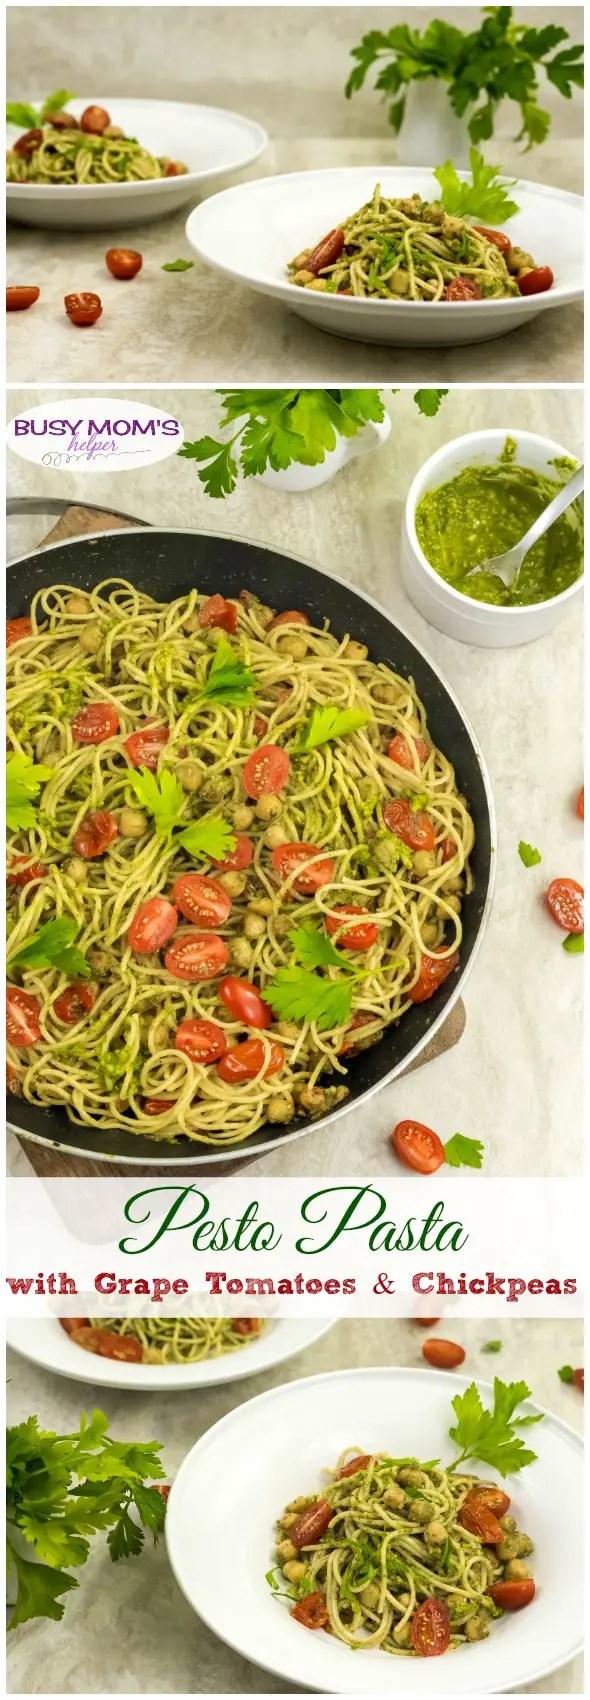 Pesto Pasta with Grape Tomatoes & Chickpeas